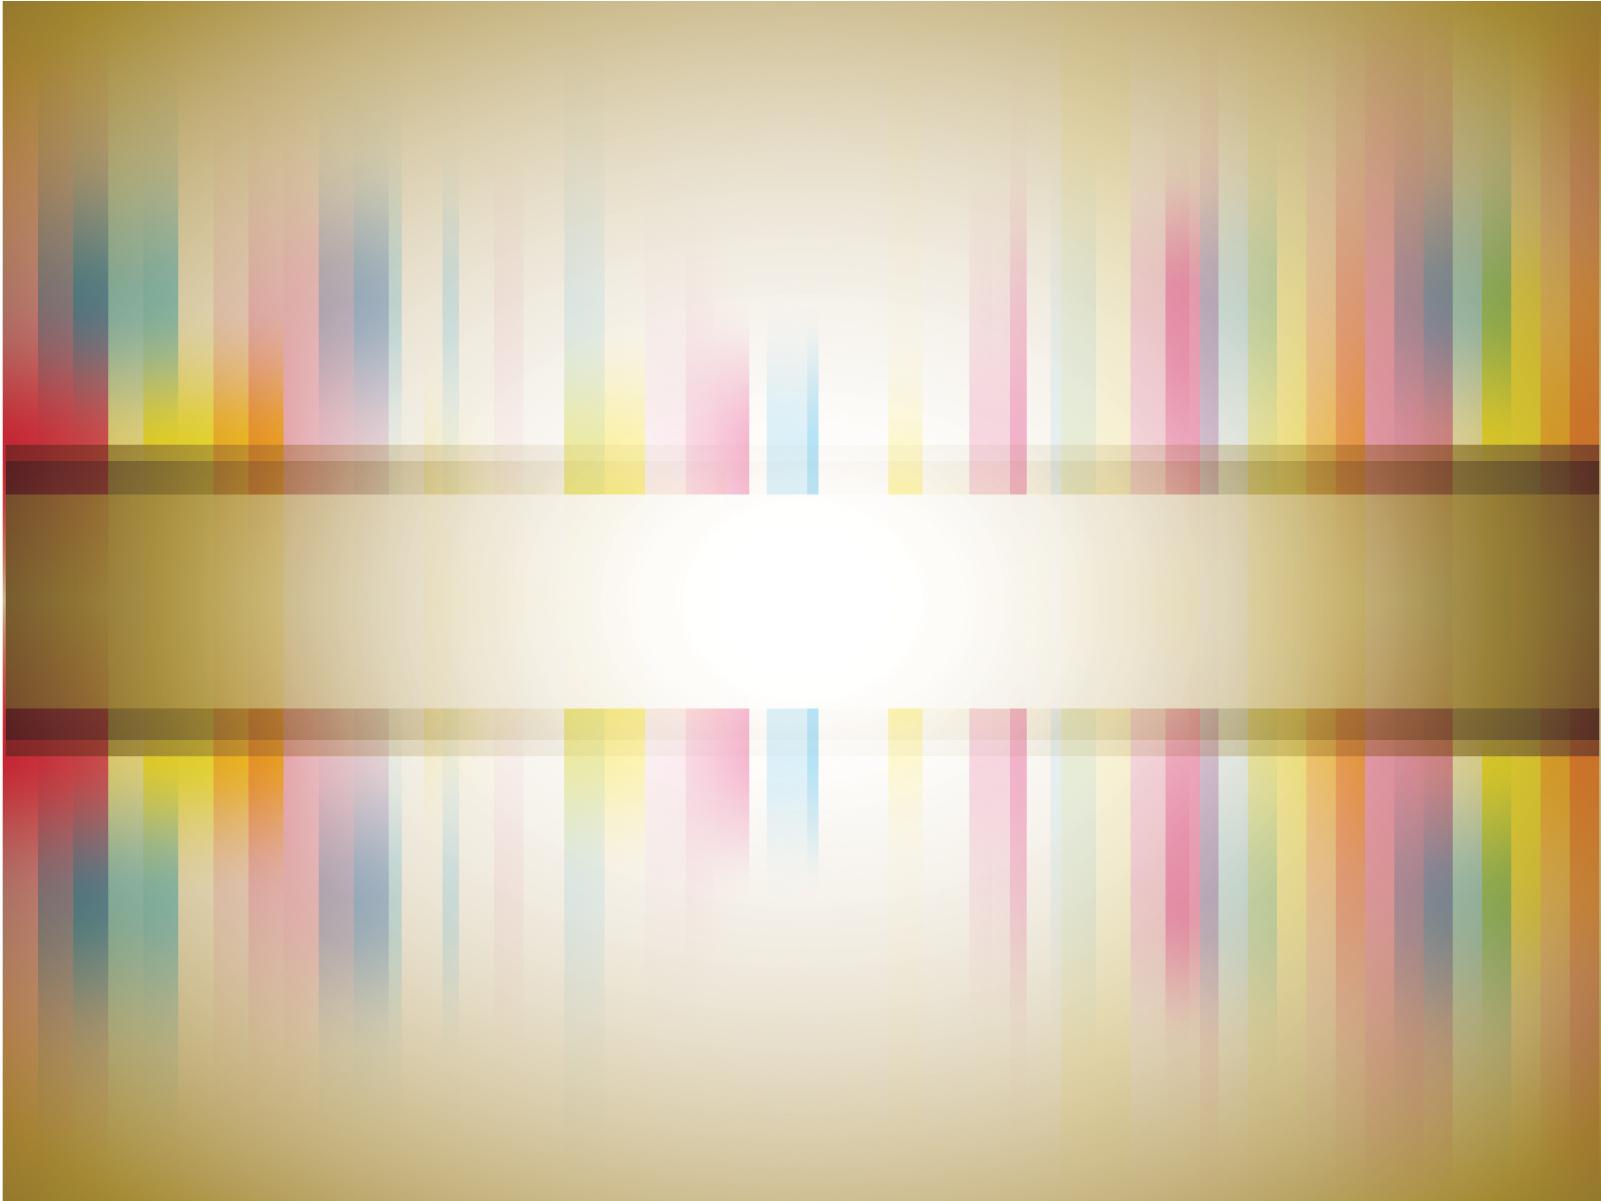 Cute Aqua Green Wallpaper Blured Color Stripes Powerpoint Templates Border